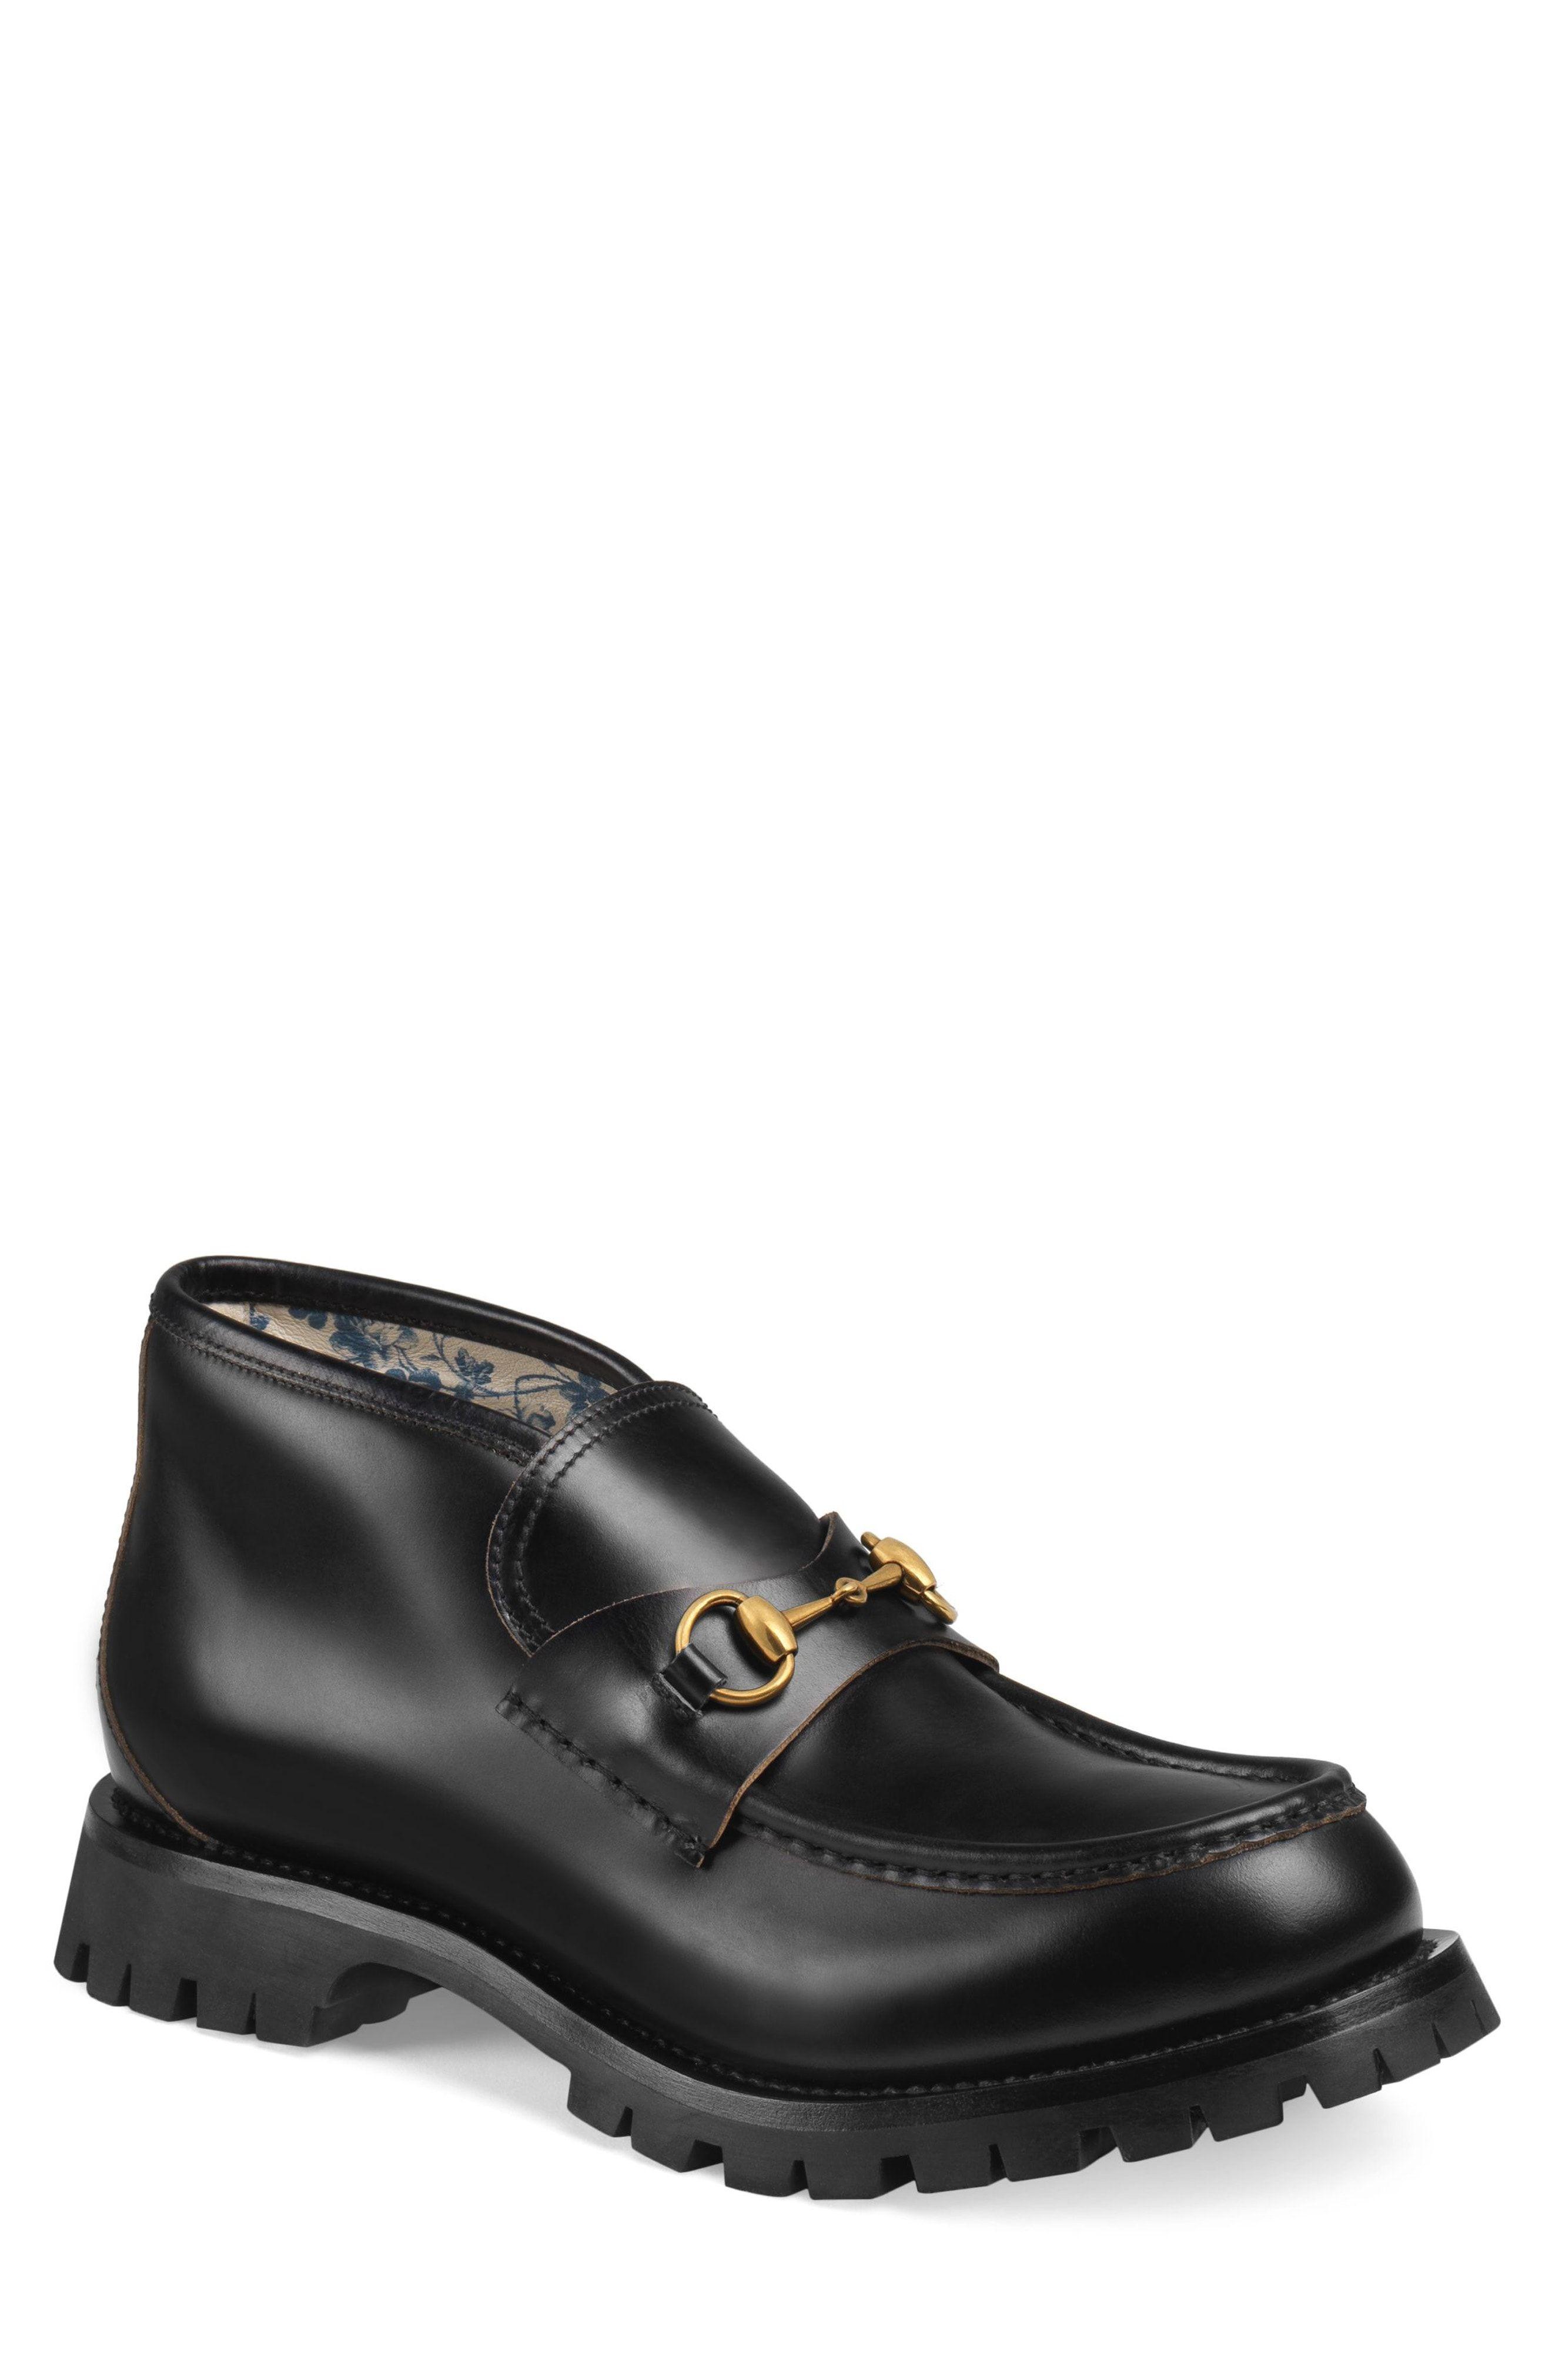 c2606d1d6 GUCCI GUICCI DJANGO HORSEBIT CHUKKA SLIP-ON. #gucci #shoes Mens Leather  Ankle